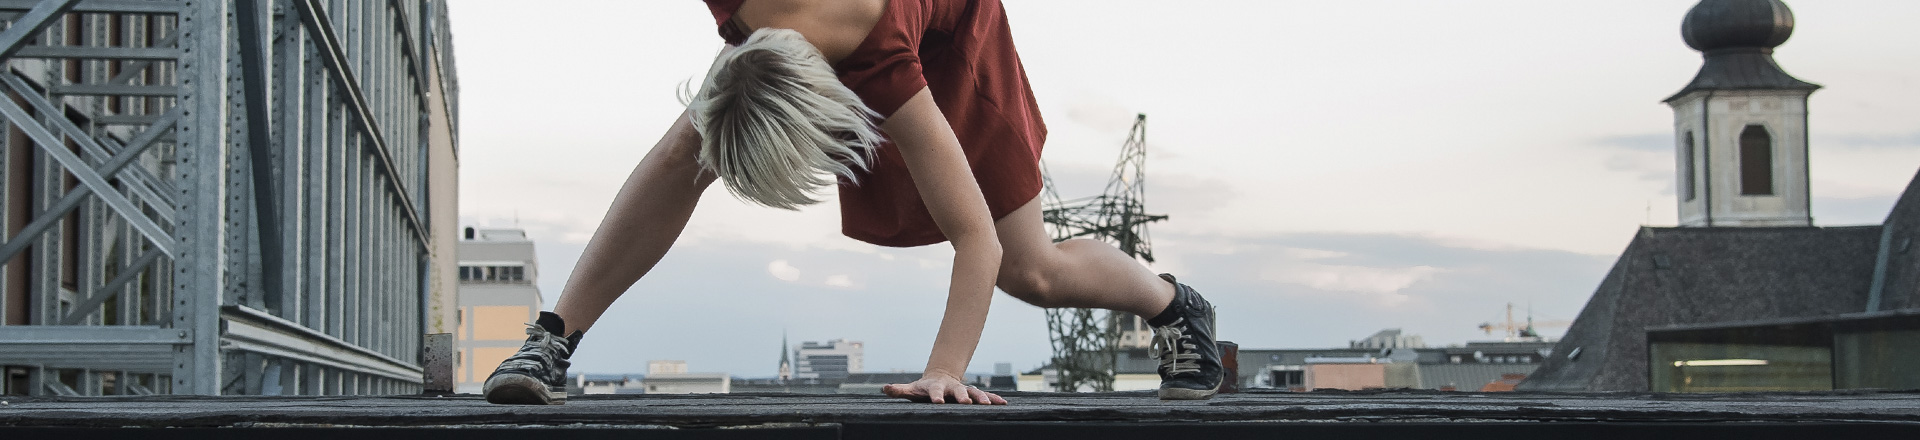 Frau am Dach Ⓒ Helmut Dachauer